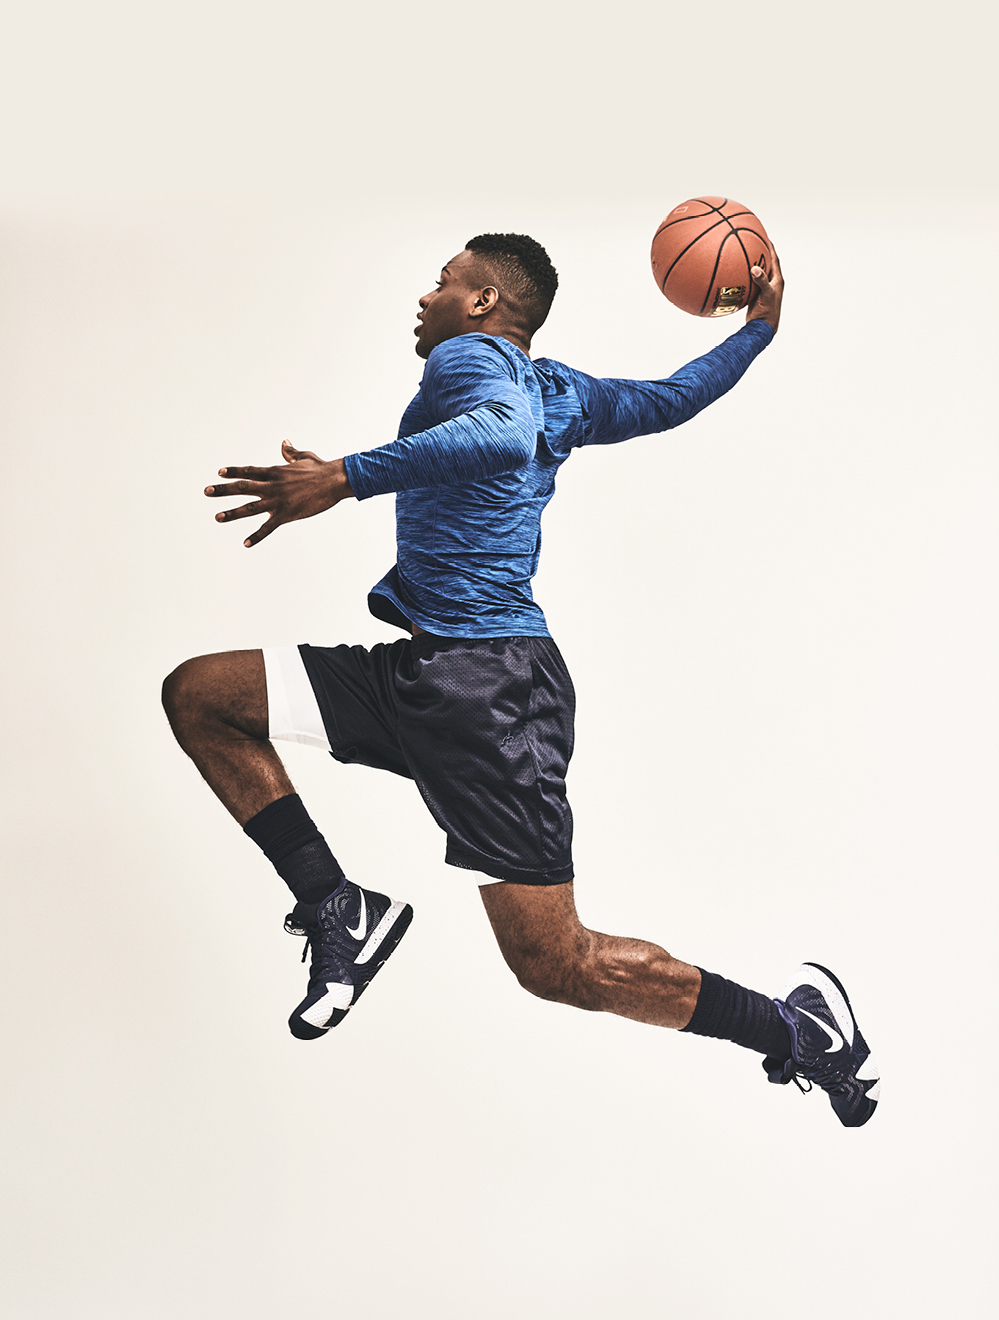 Everett_Aaron_Okayama_Basketball0.jpg